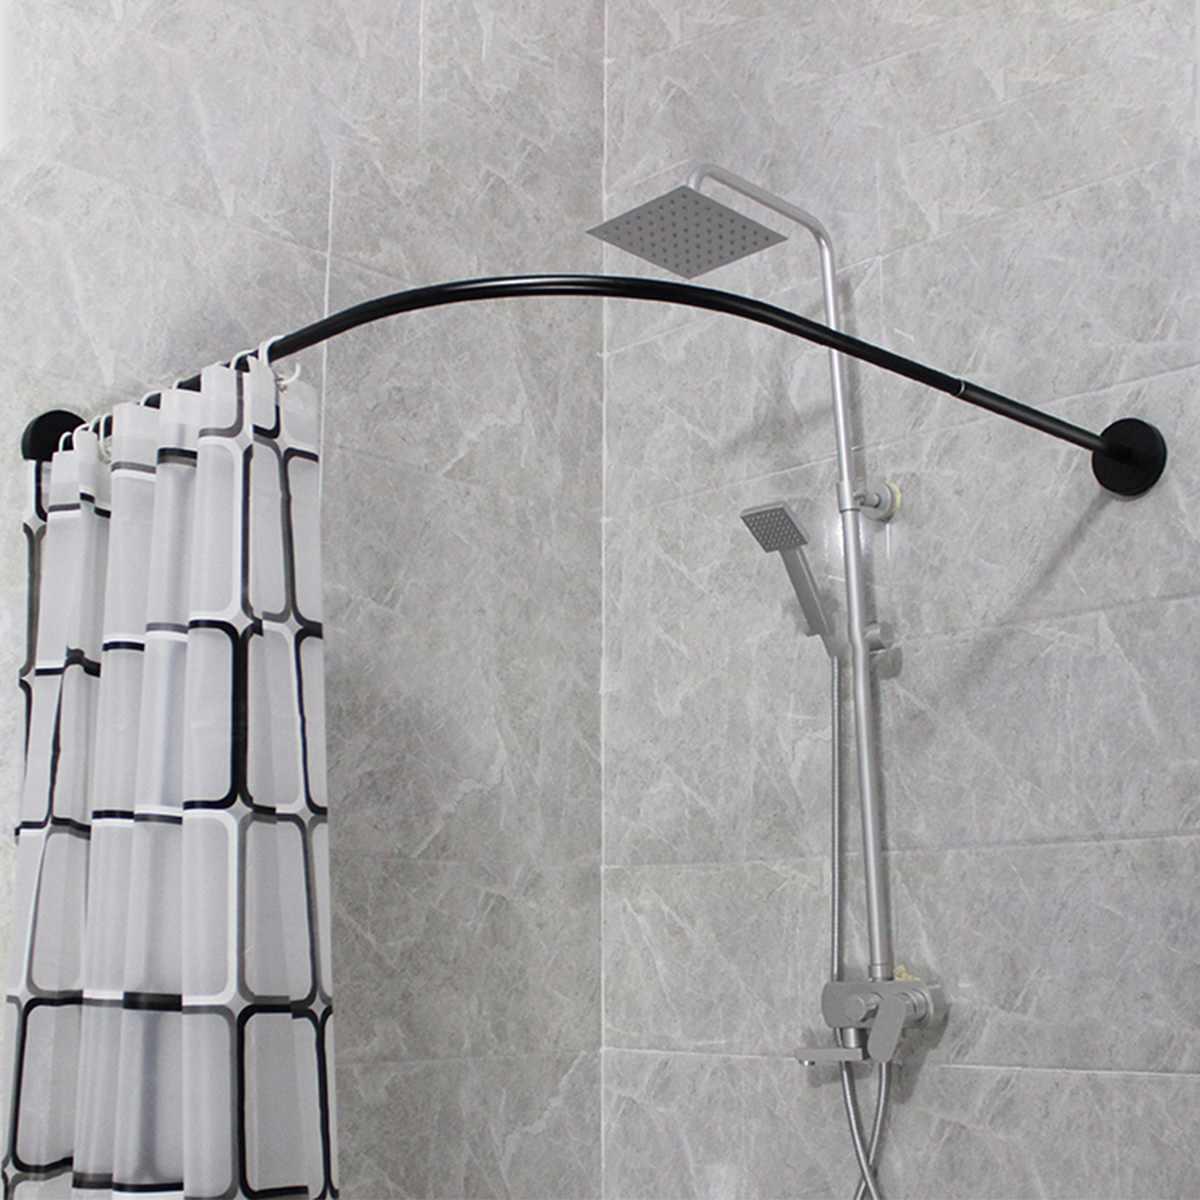 Extendable Corner Shower Curtain Rod Pole 31-47inch Rail Rod Bar Bath Door